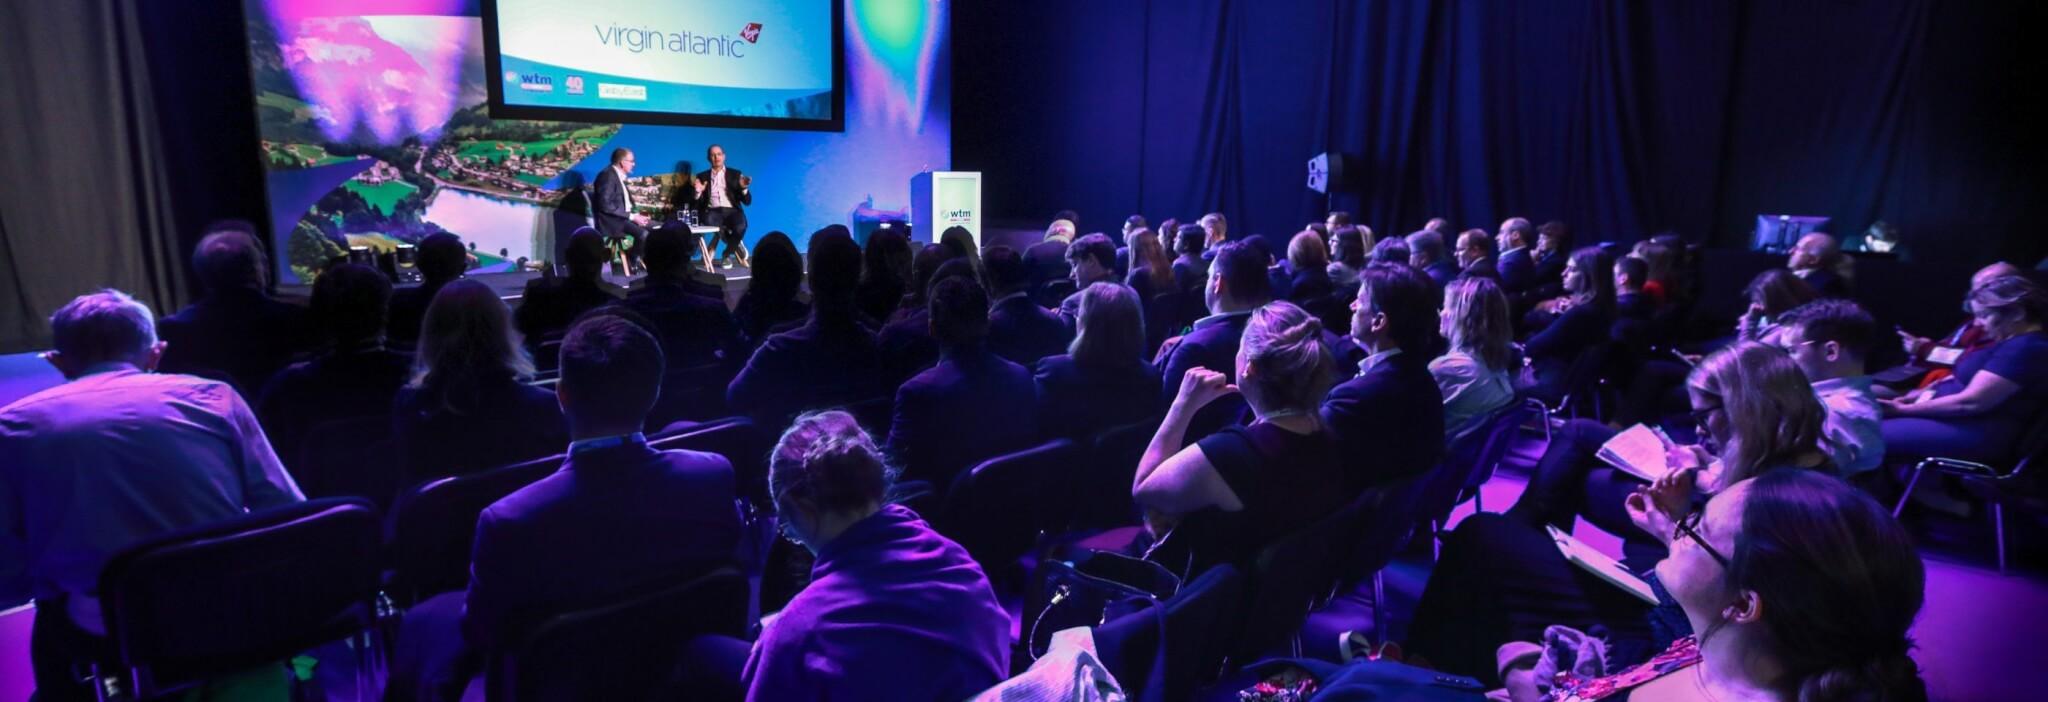 WTM: London Welcomes Industry Bosses to Speak on Global Stage